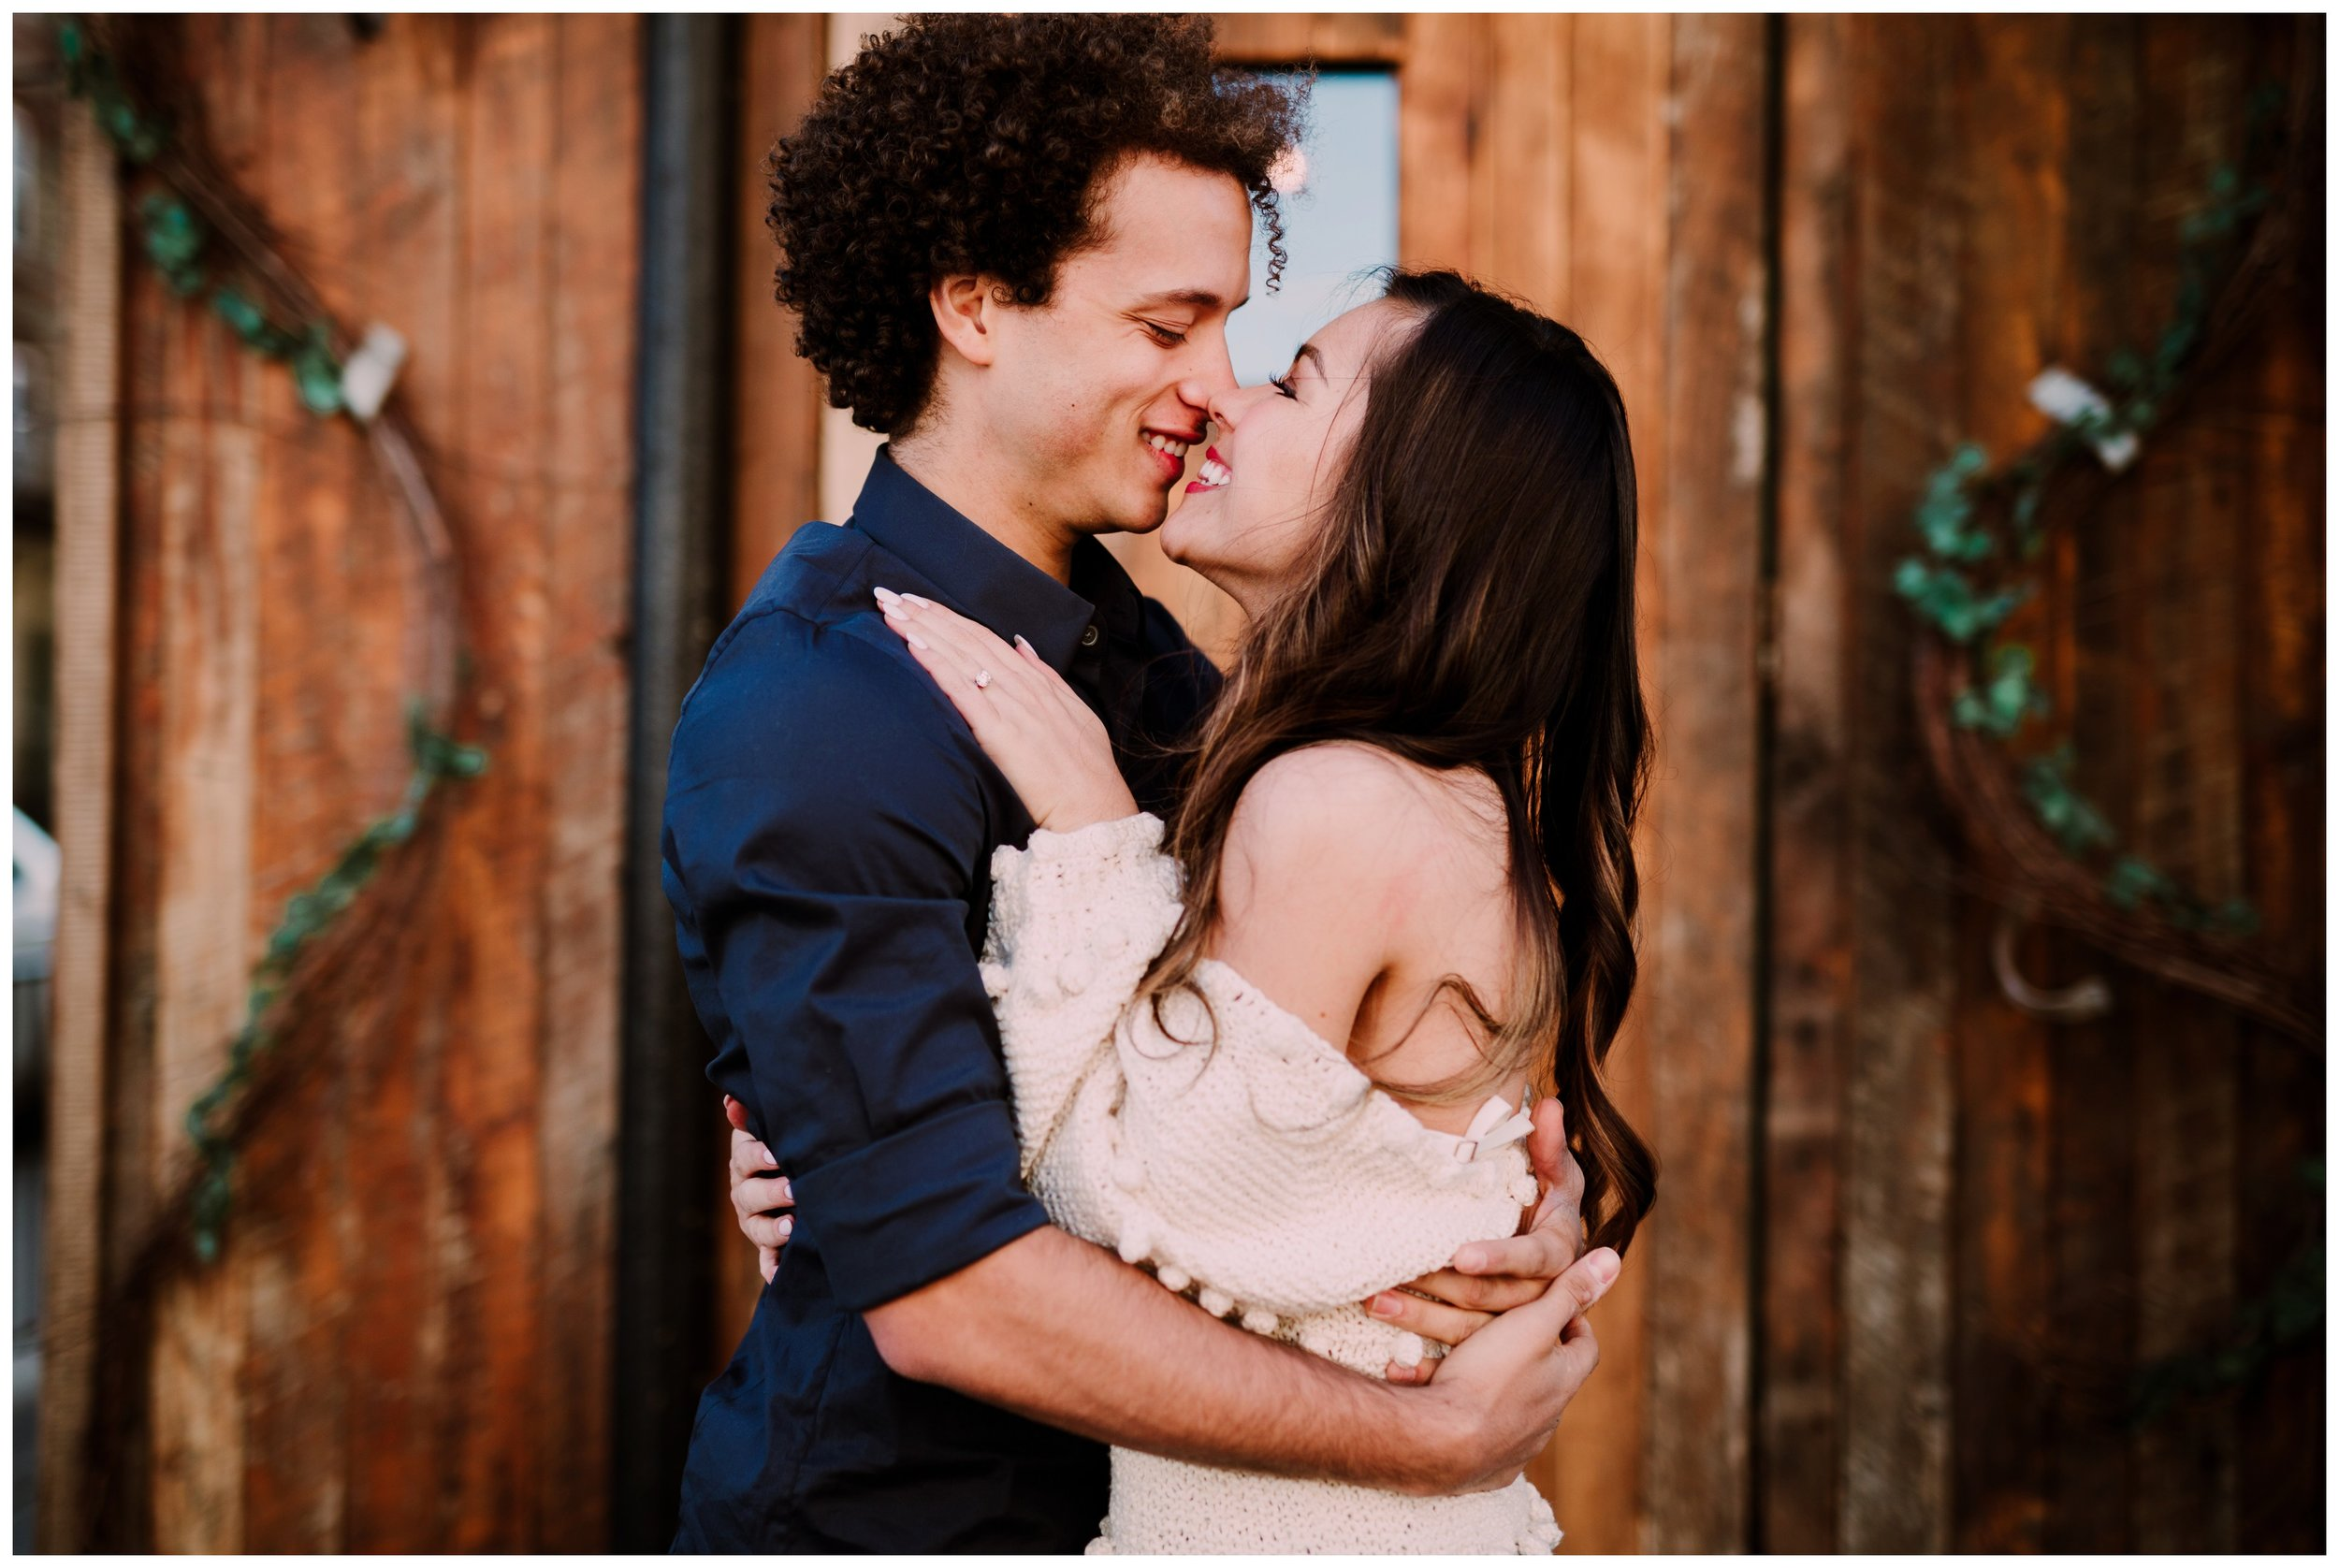 Grace and Damon   Stylish Chelsea NYC and Hoboken Engagement Session   NYC Wedding Photographer-68.jpg